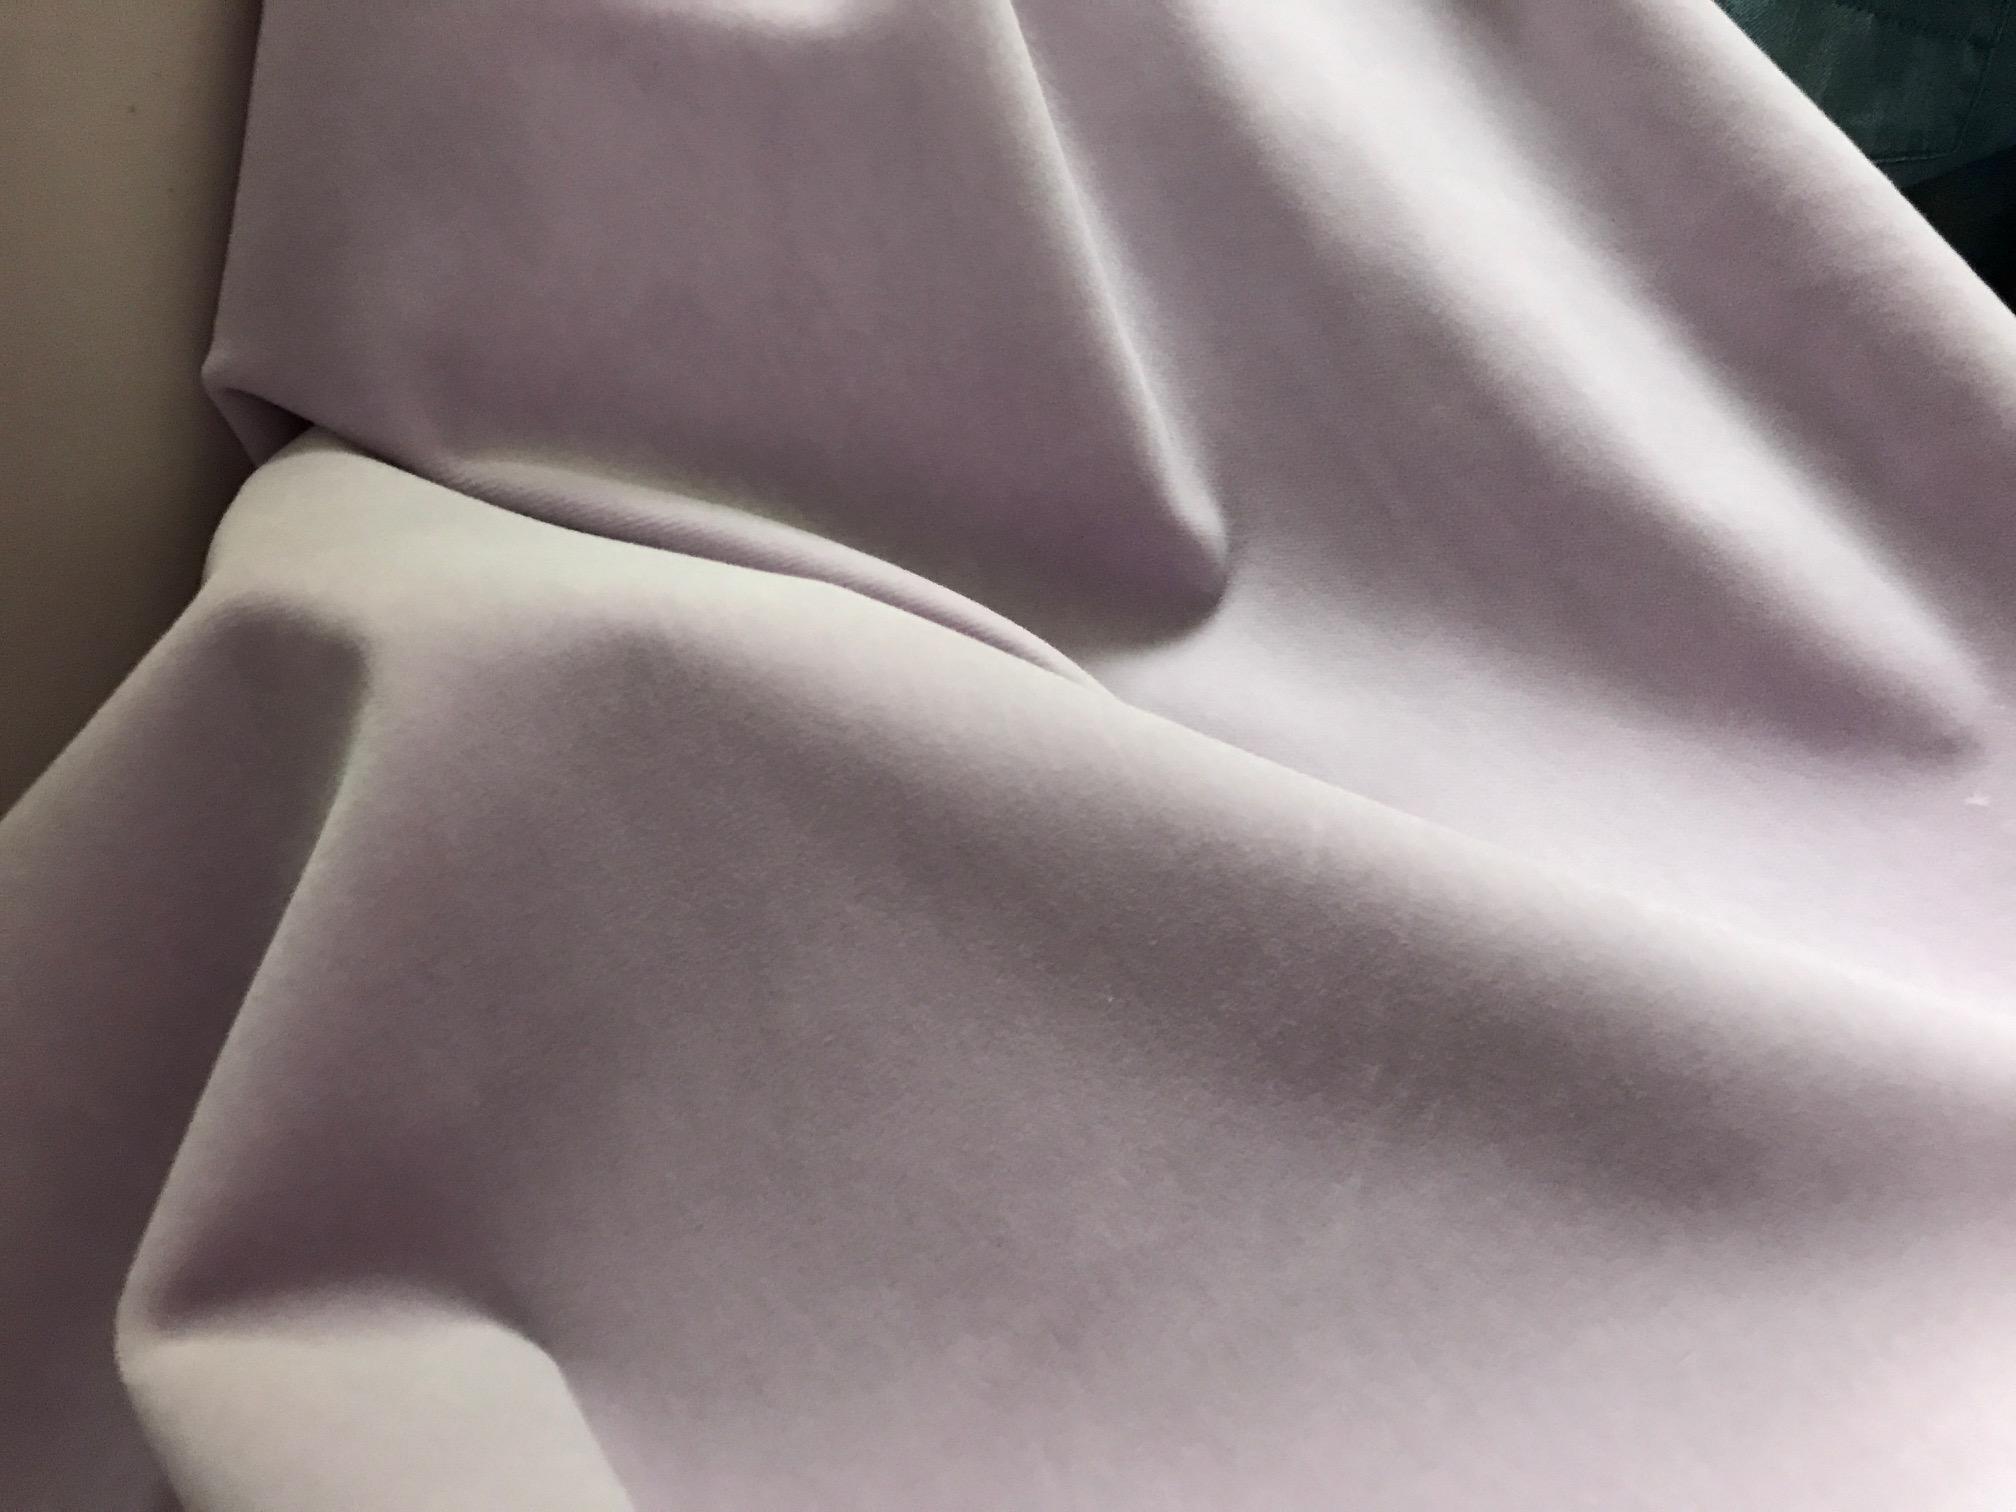 Terciopelo de algodón malva